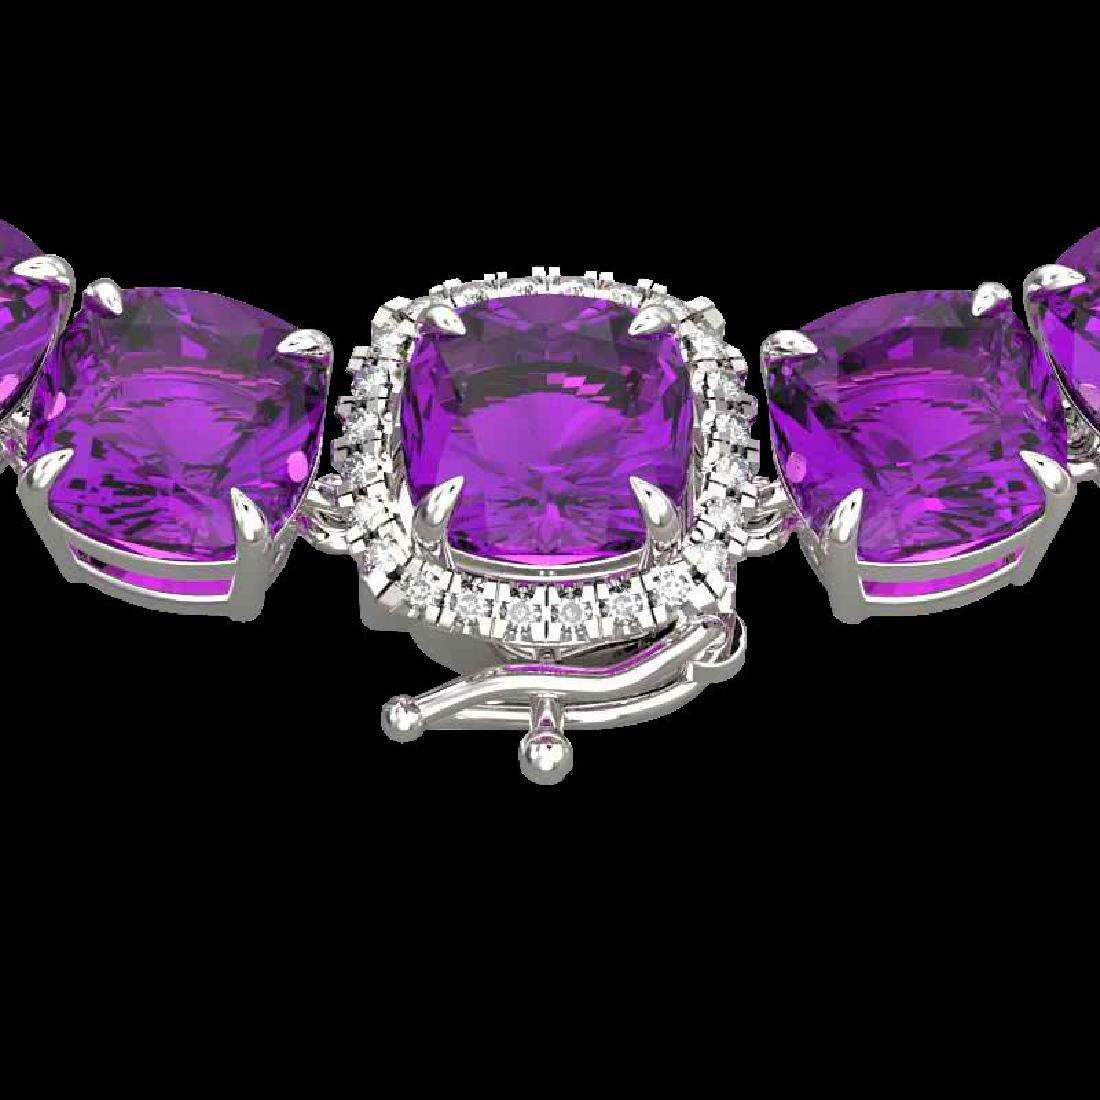 116 CTW Amethyst & VS/SI Diamond Halo Micro Necklace